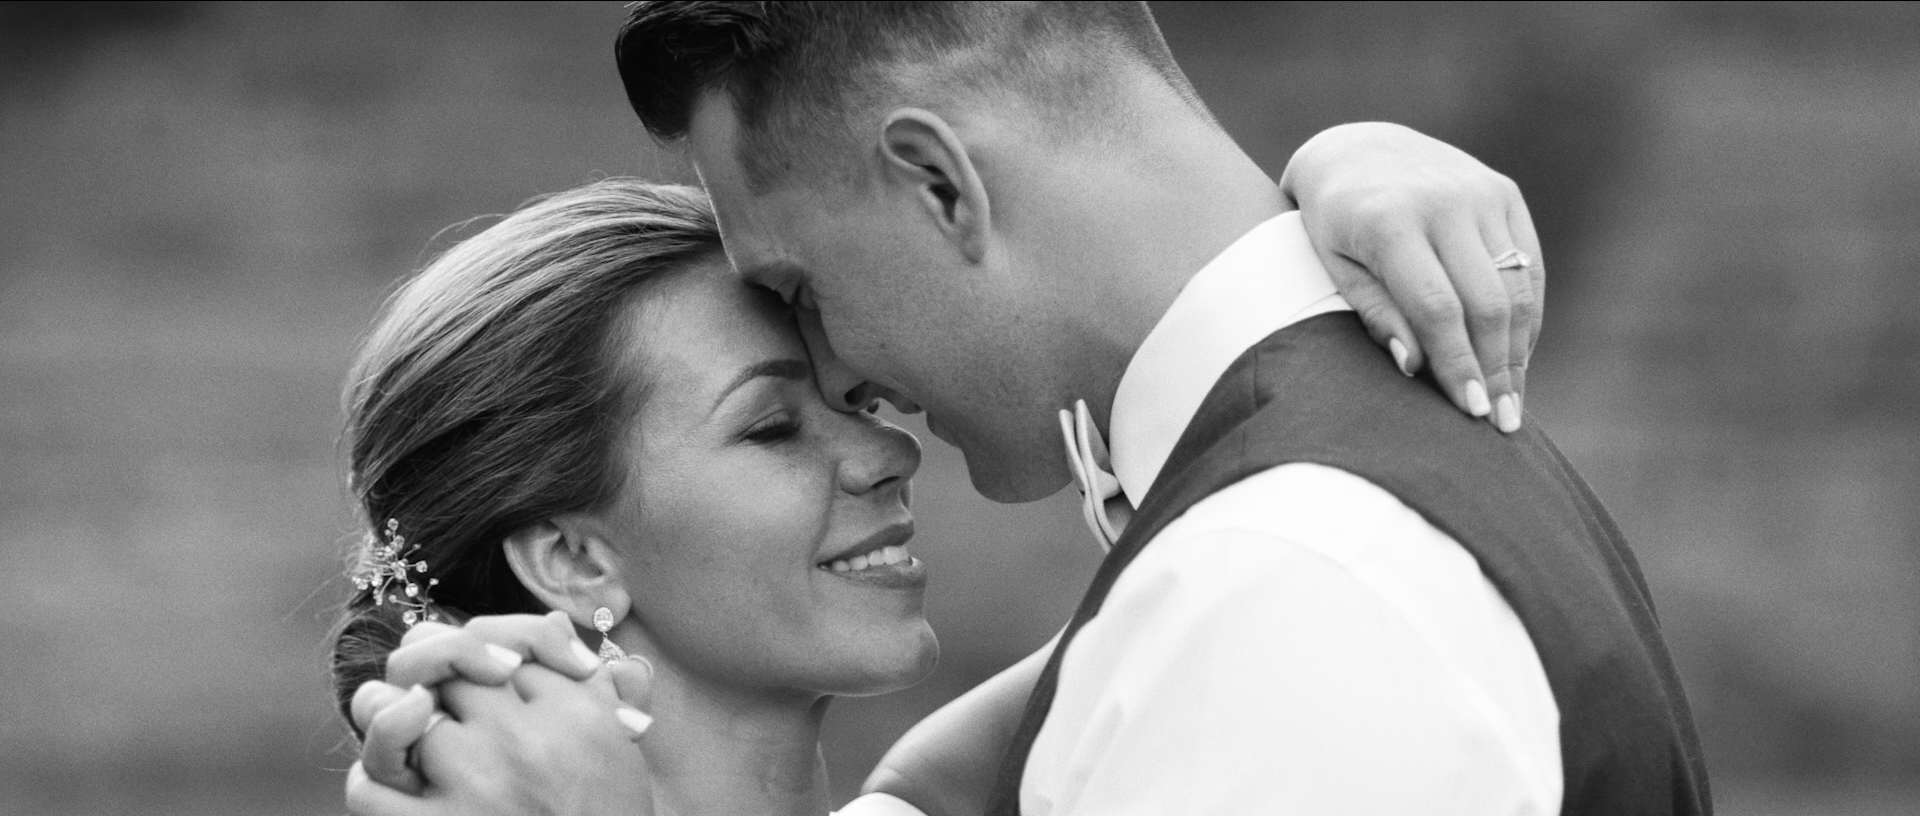 Lewis+Clark+College+Wedding+Videographer+Photographer_017.png